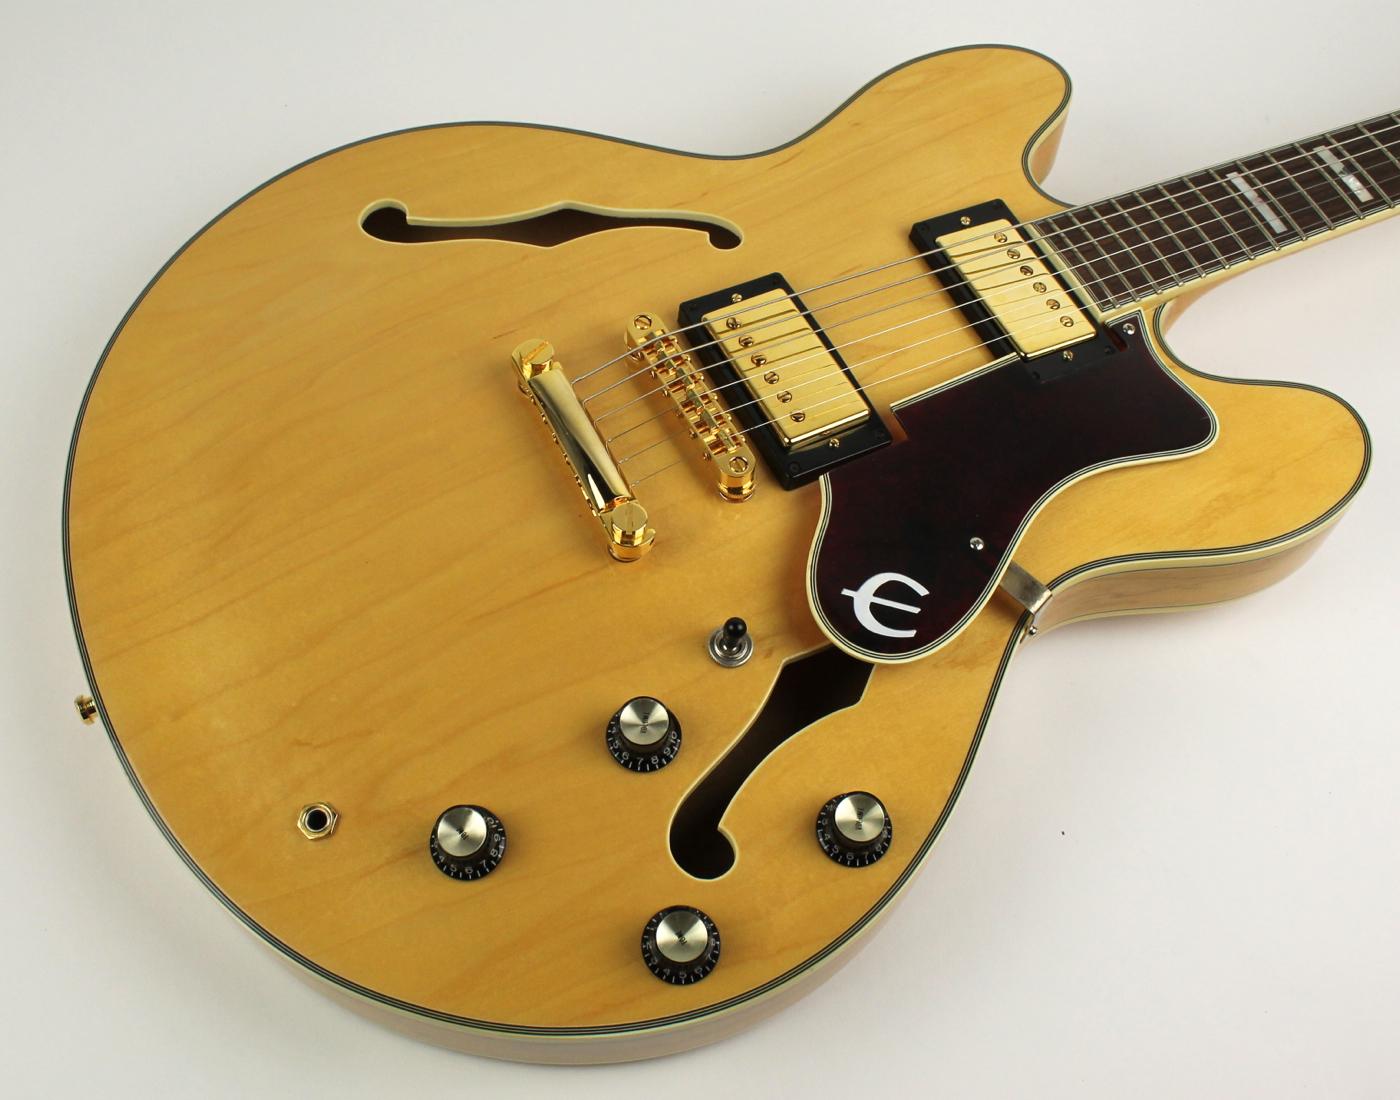 epiphone sheraton 1999 natural guitar for sale thunder road guitars. Black Bedroom Furniture Sets. Home Design Ideas